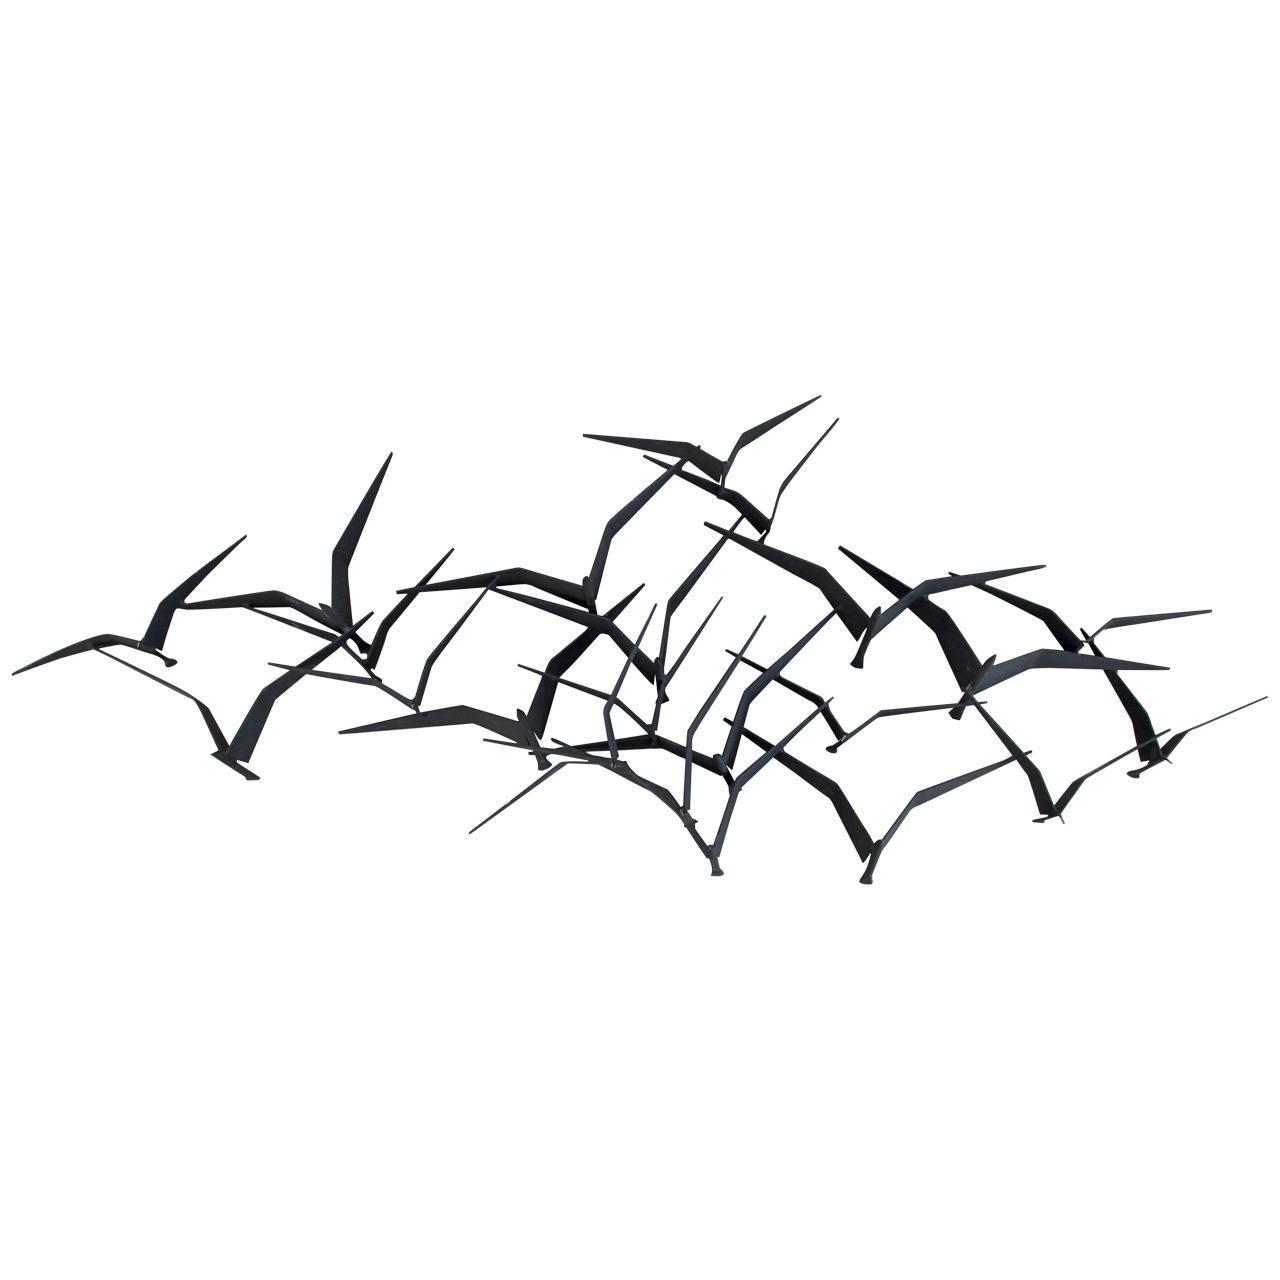 Wall Art Ideas Design : Famous Artisan Metal Wall Art Birds In Within Metal Wall Art Birds In Flight (View 2 of 20)